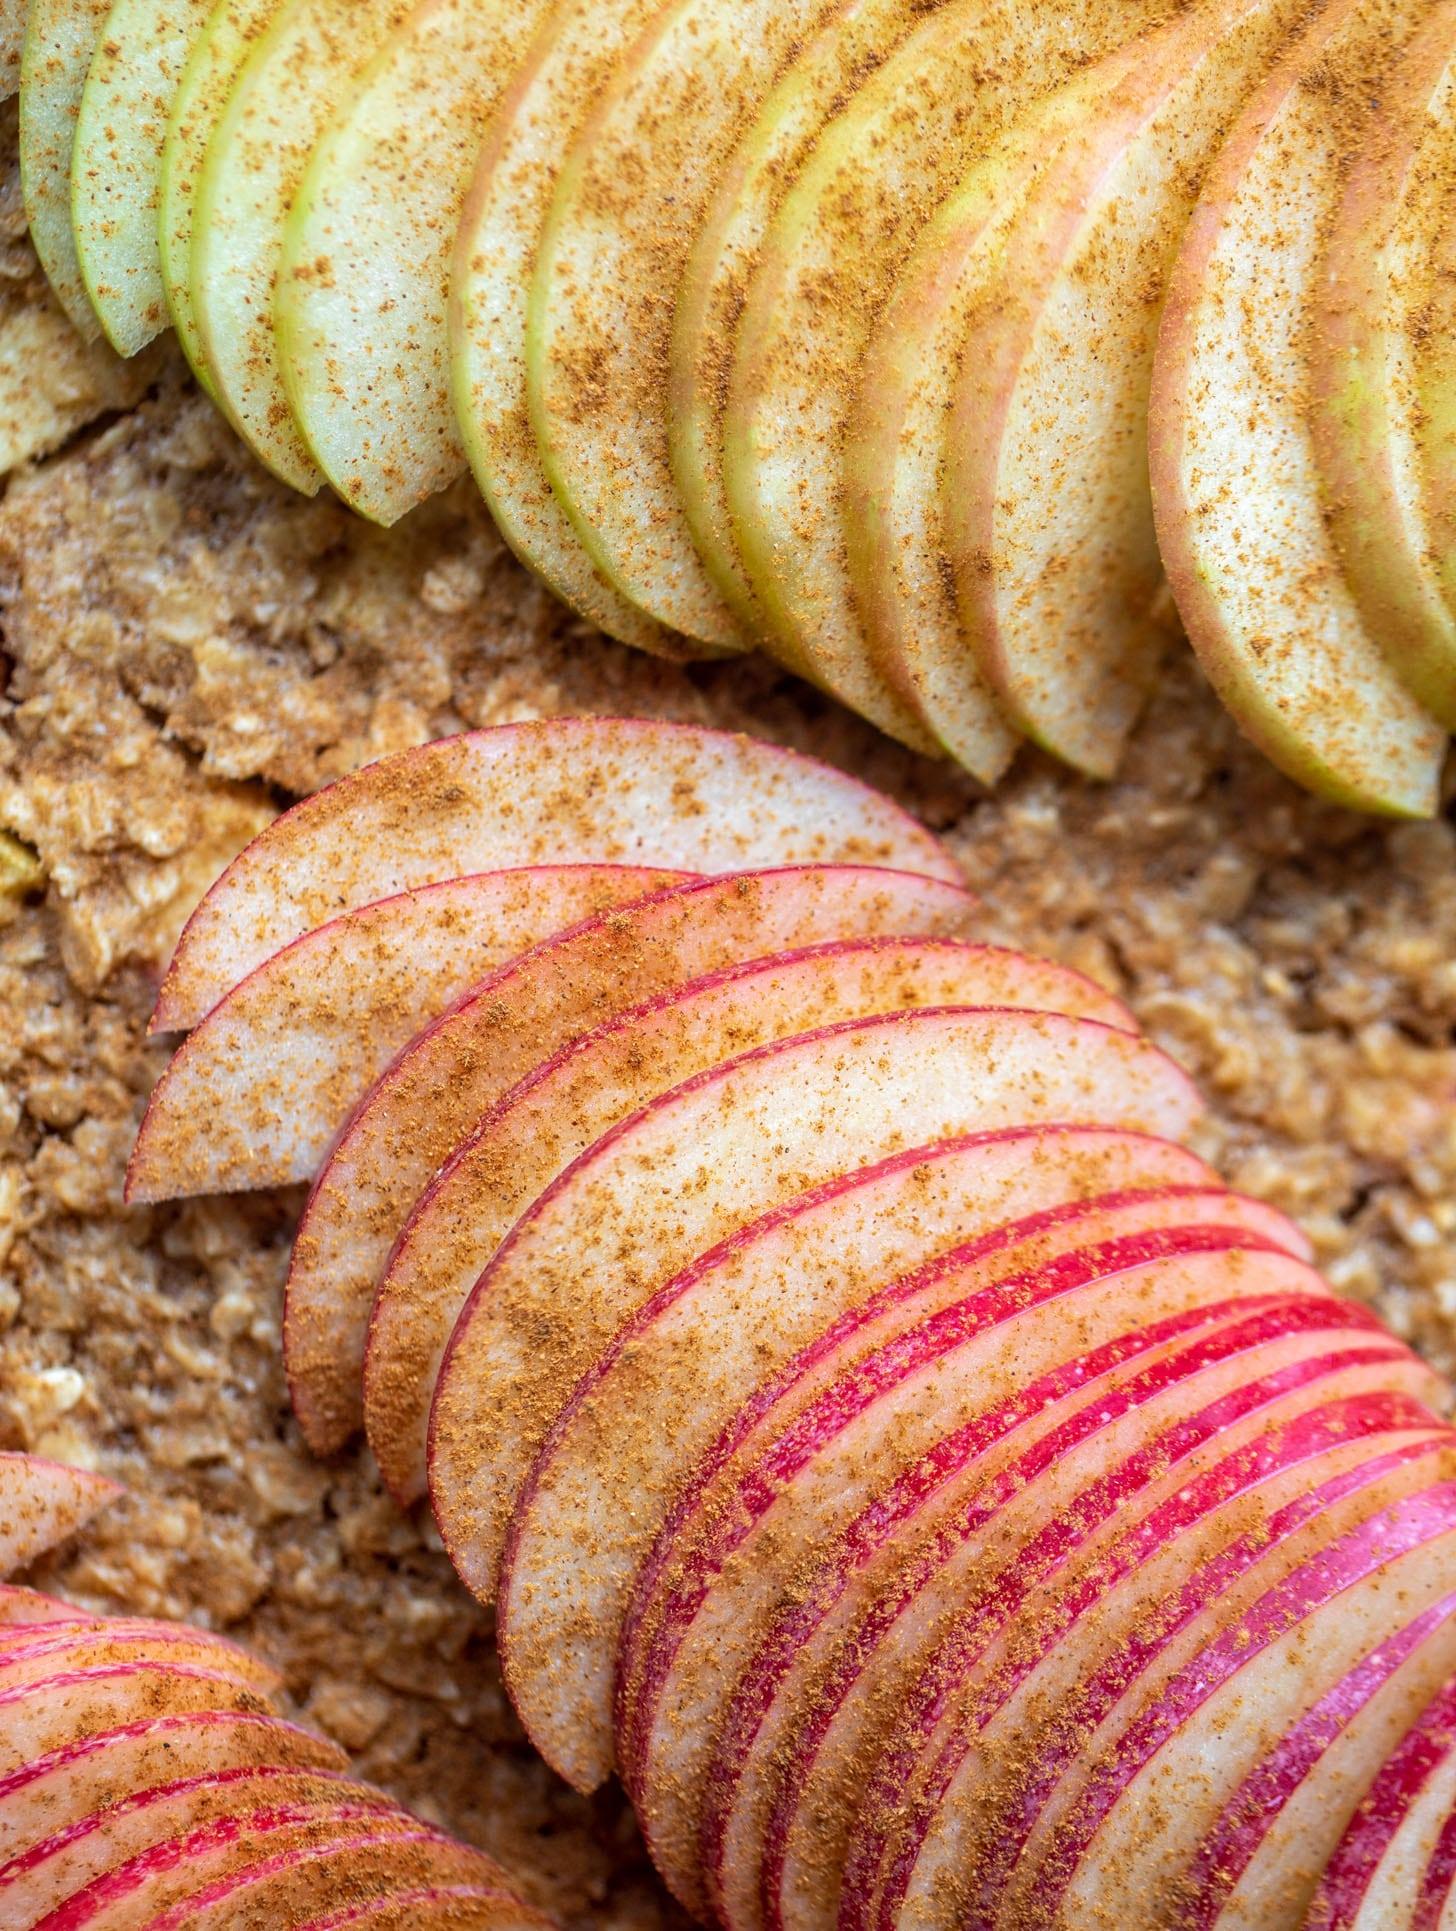 sliced apples with cinnamon